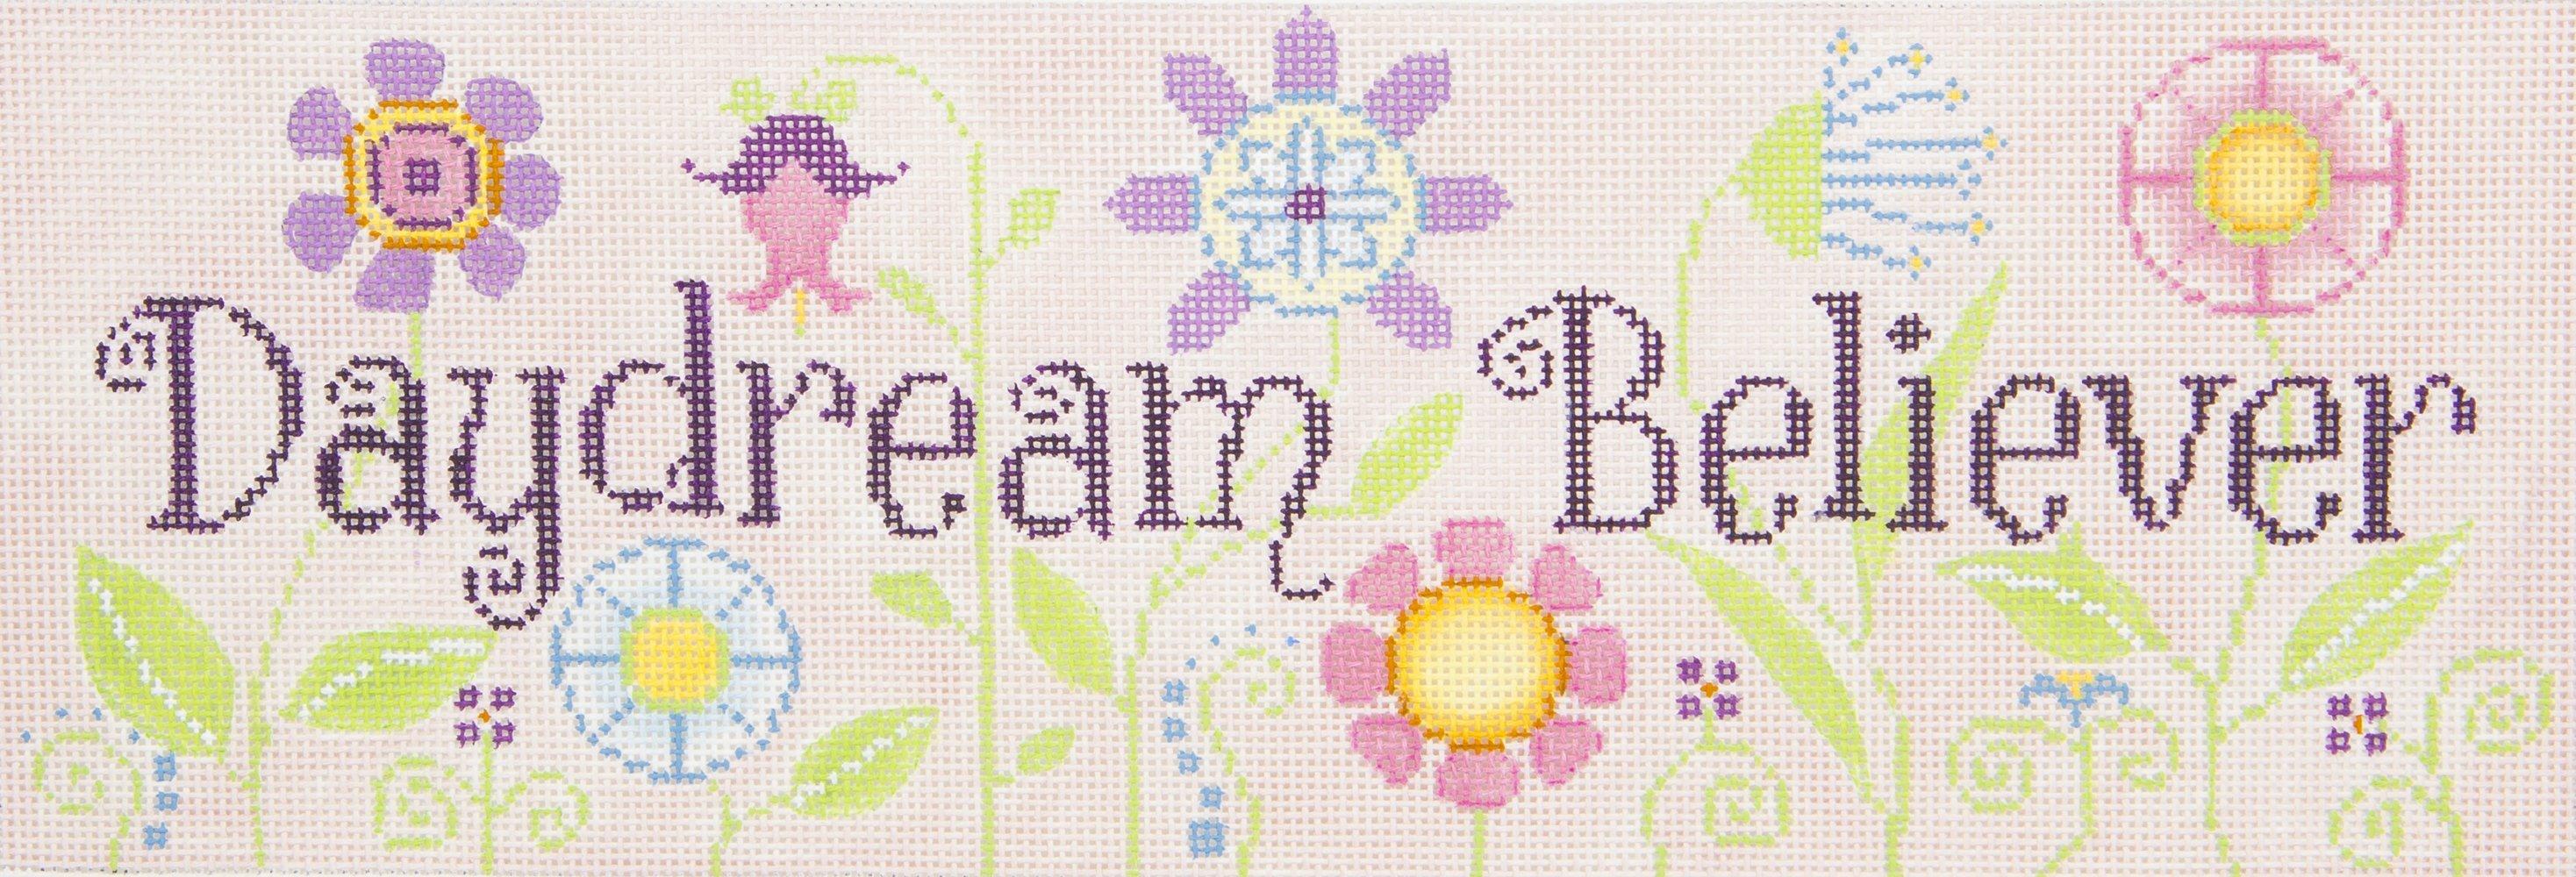 B457 Daydream Believer Brenda Stofft Designs